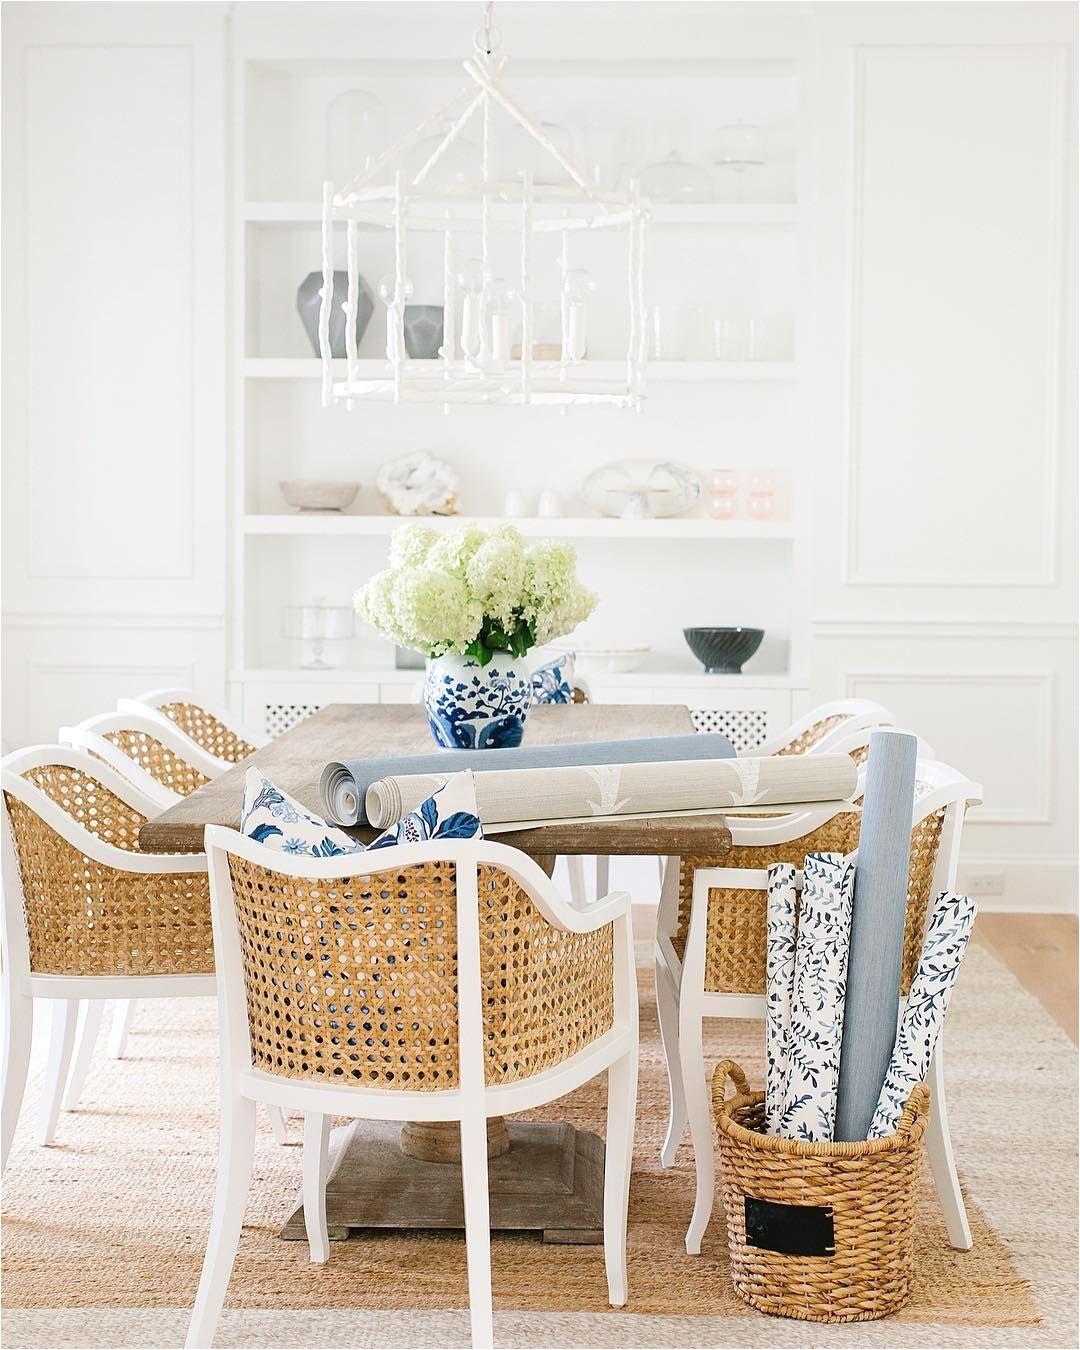 wallpaper priano dining room inspiration image via monikahibbs